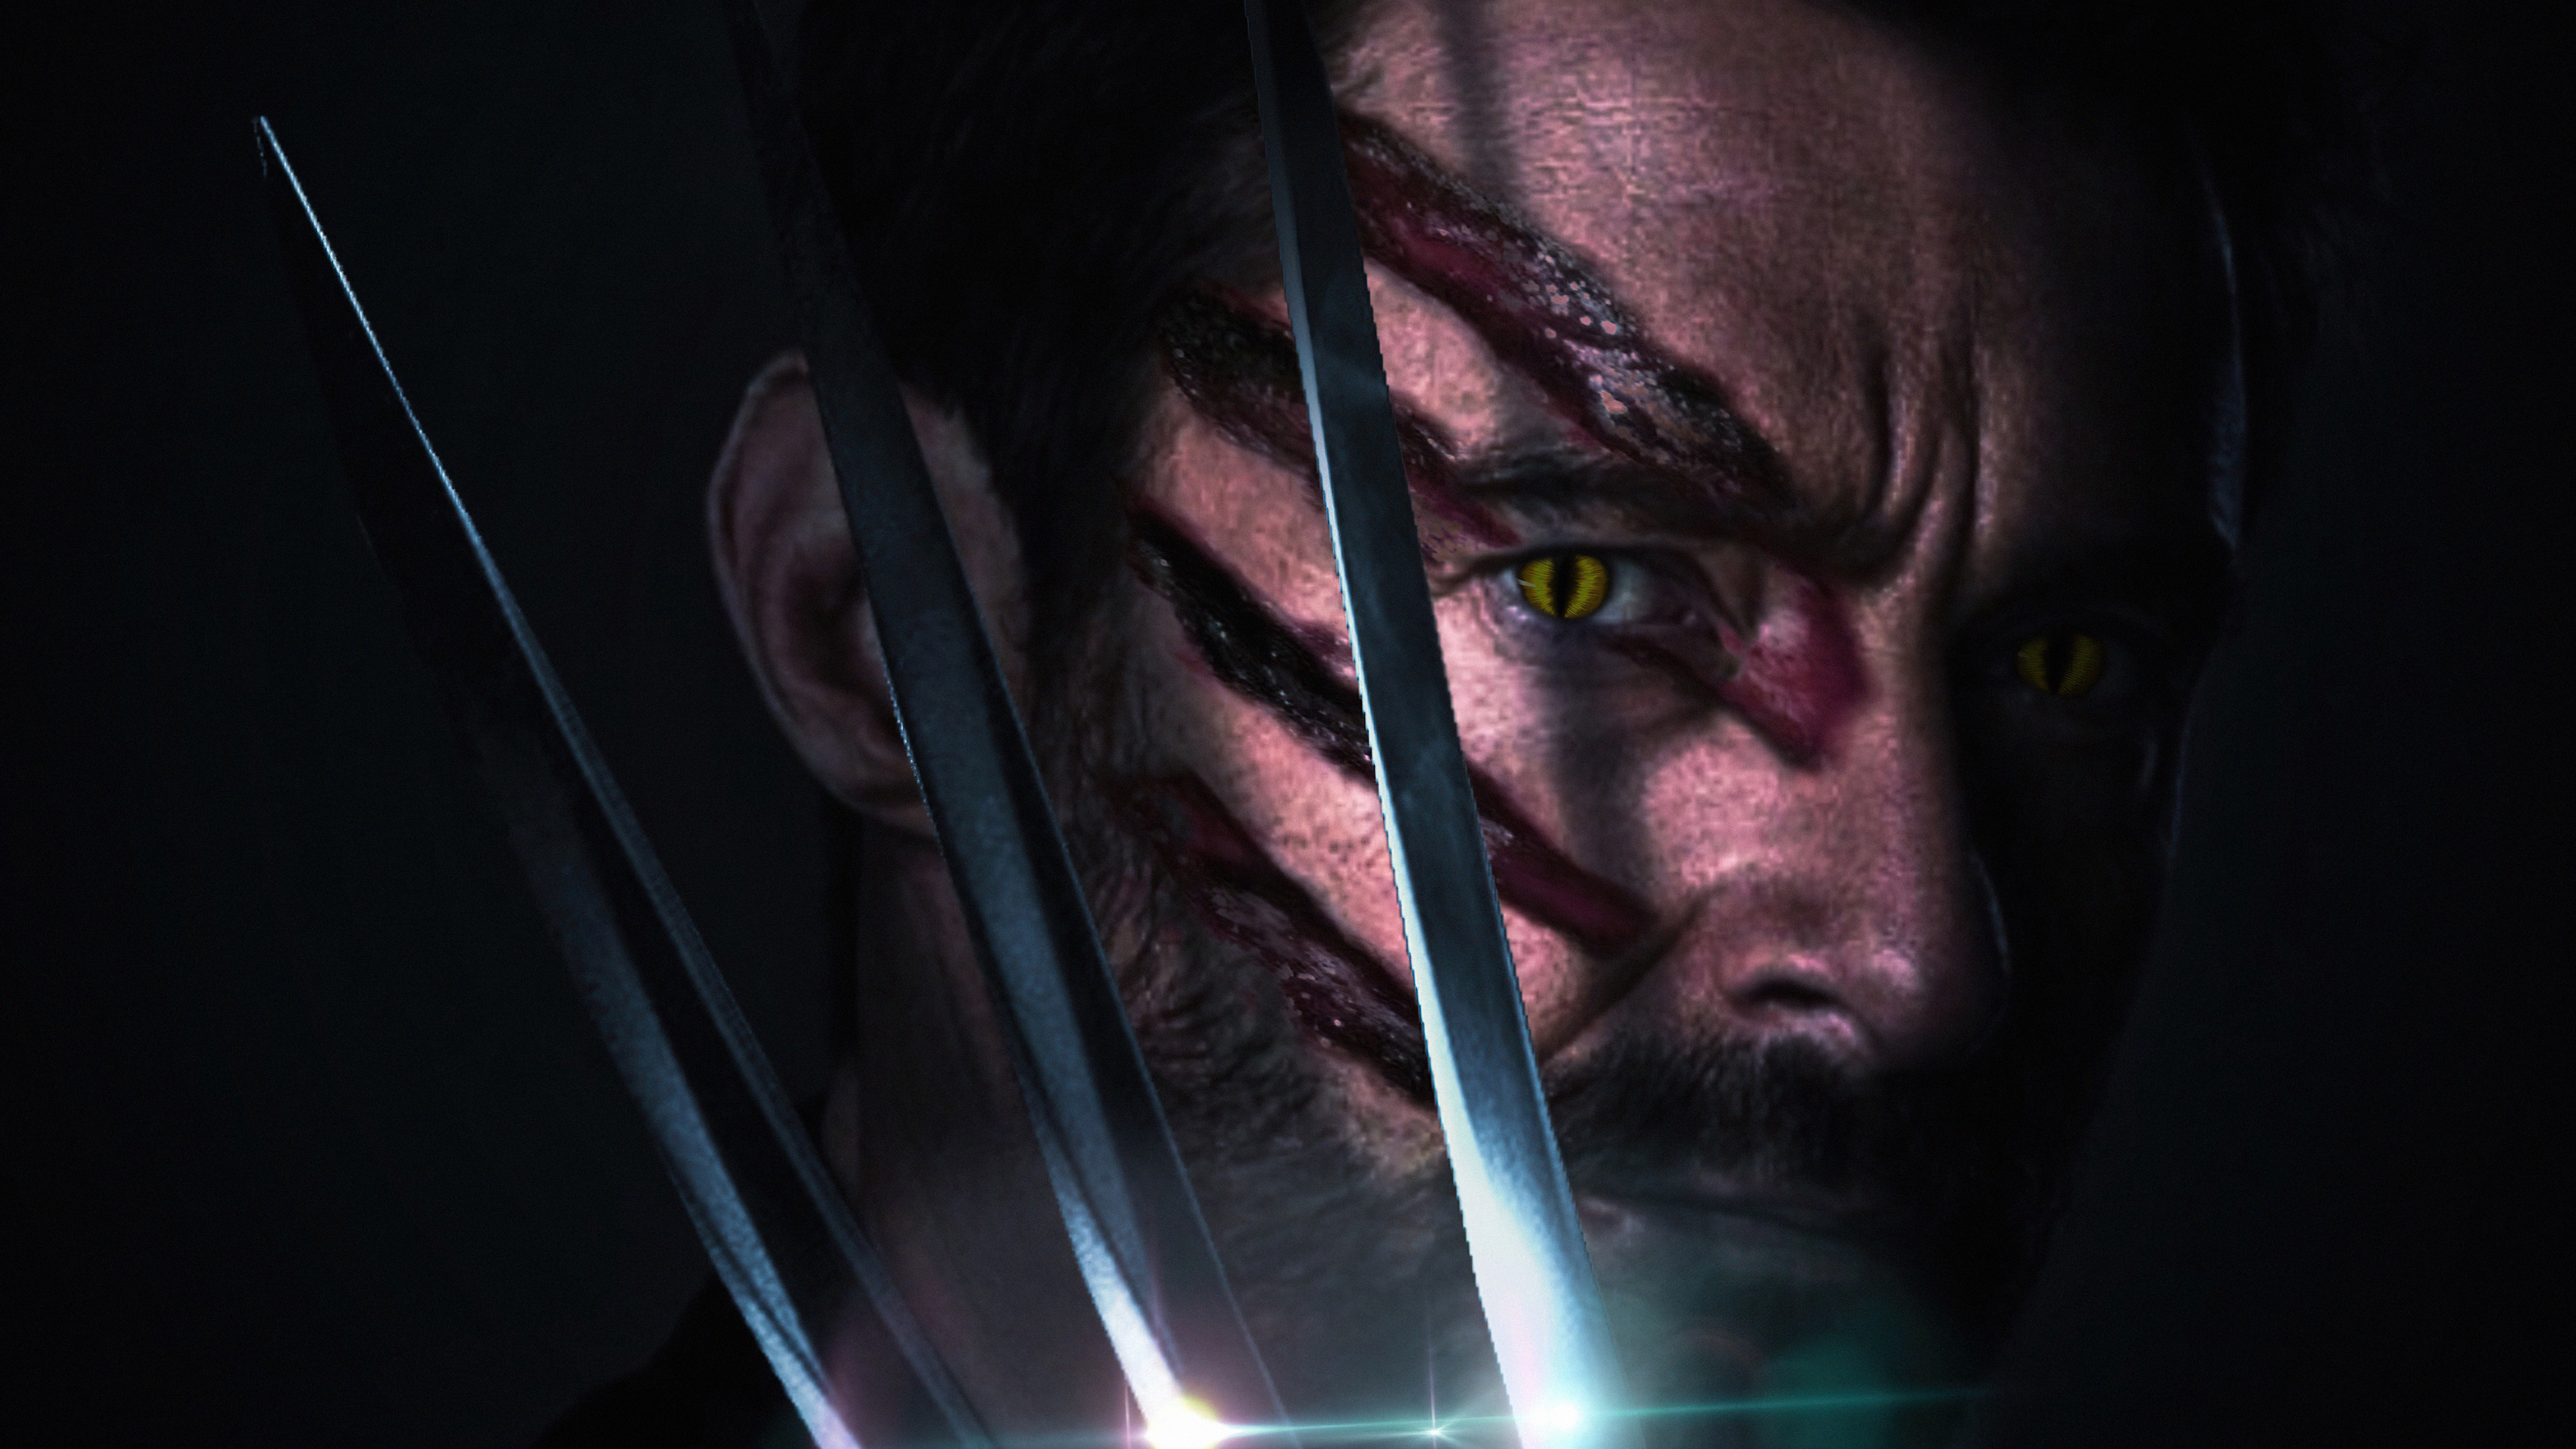 Fondos de pantalla Garras de Wolverine